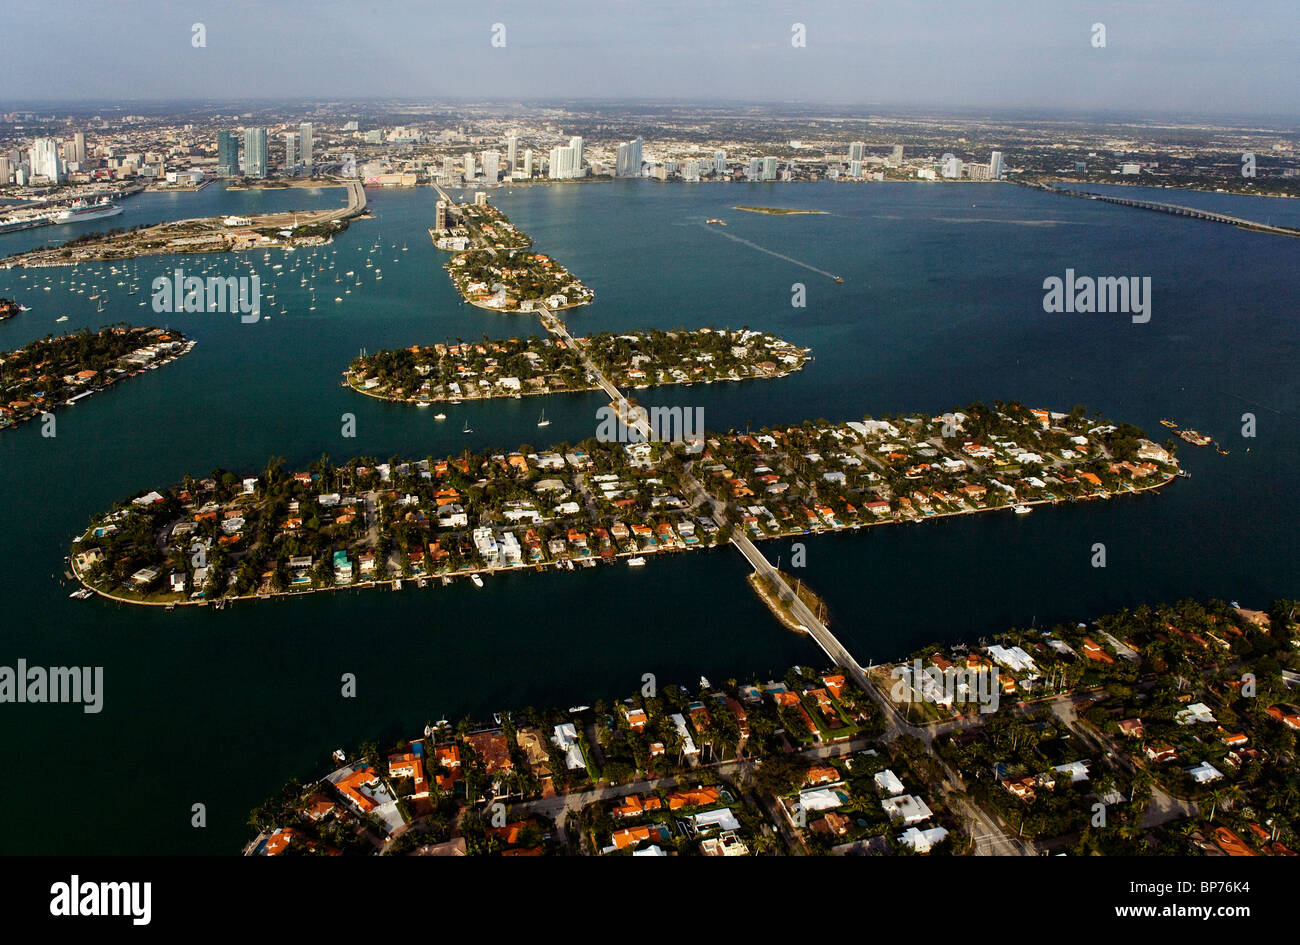 aerial view above Venetian Islands Rivo Alto Di Lido Marino San Marco island Biscayne Bay Miami Dade county Florida - Stock Image